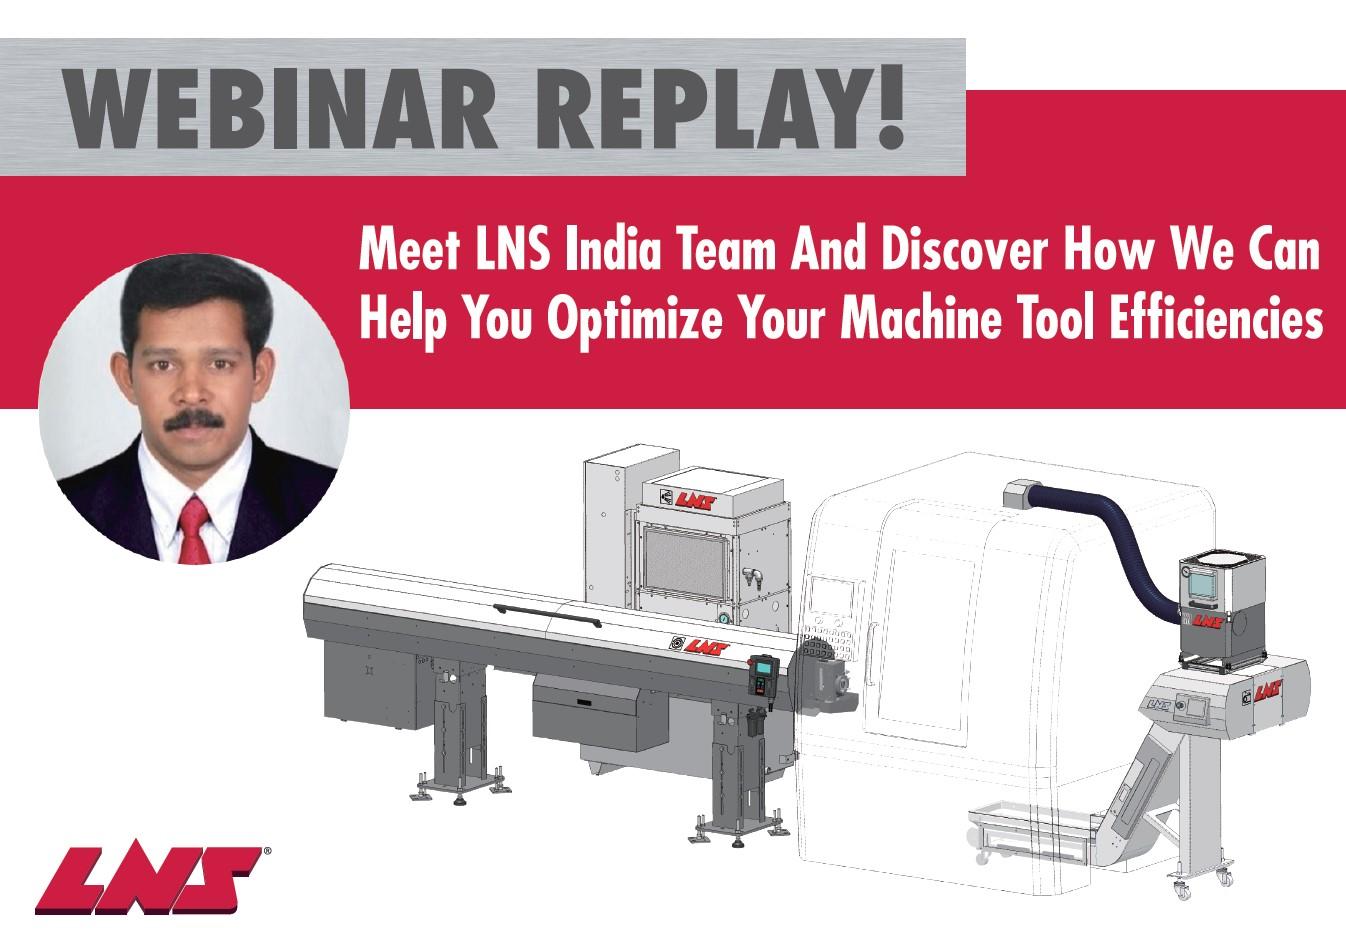 INDIA WEBINAR: Meet LNS India Team & Discover How We Can Help You Optimize Your Machine Tool Efficiencies